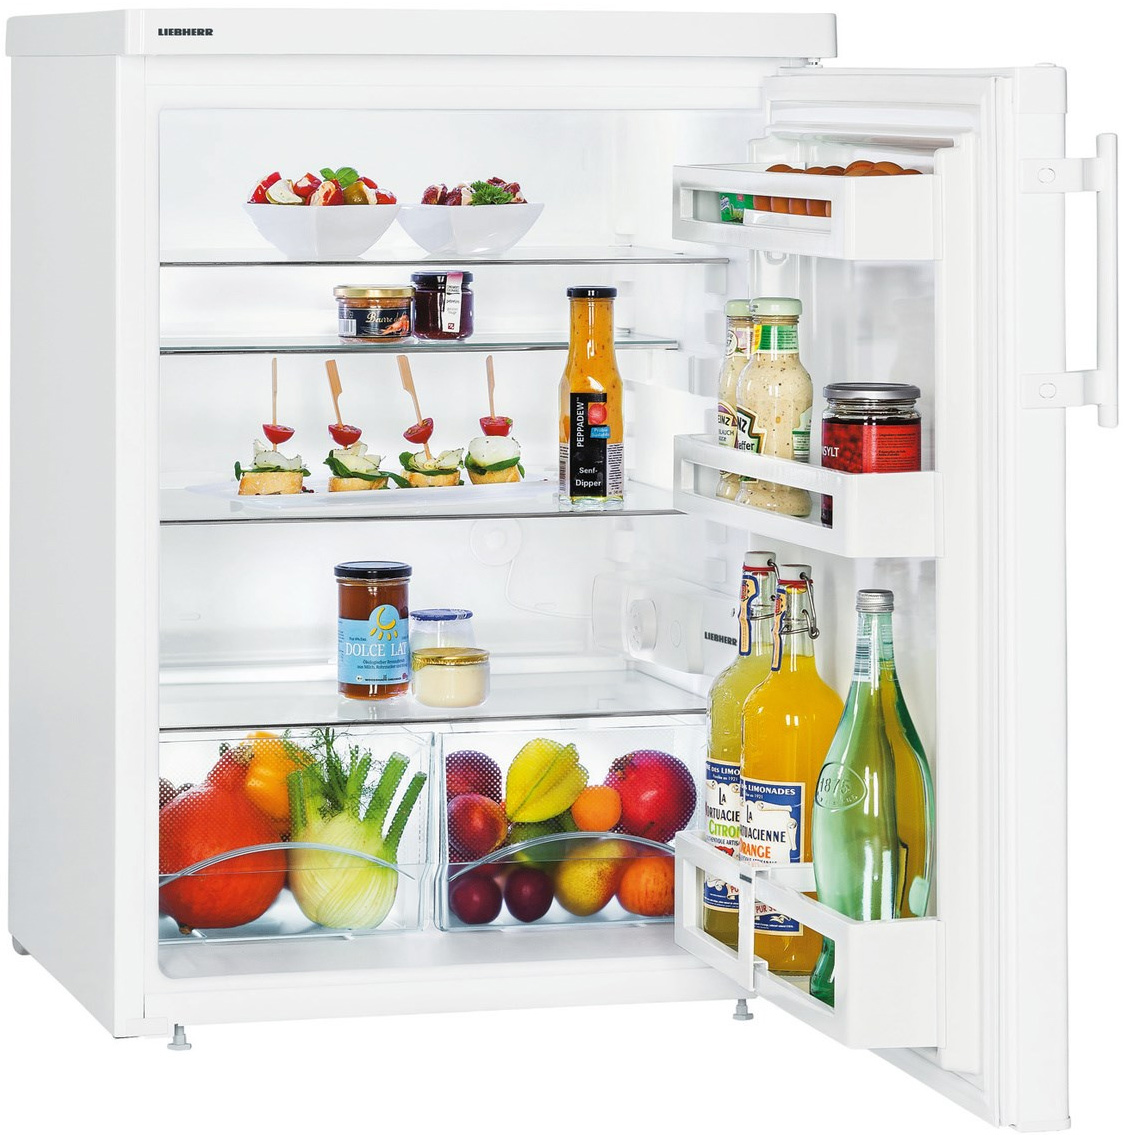 Холодильник Liebherr Comfort, T 1810-21 001, однокамерный, белый Liebherr